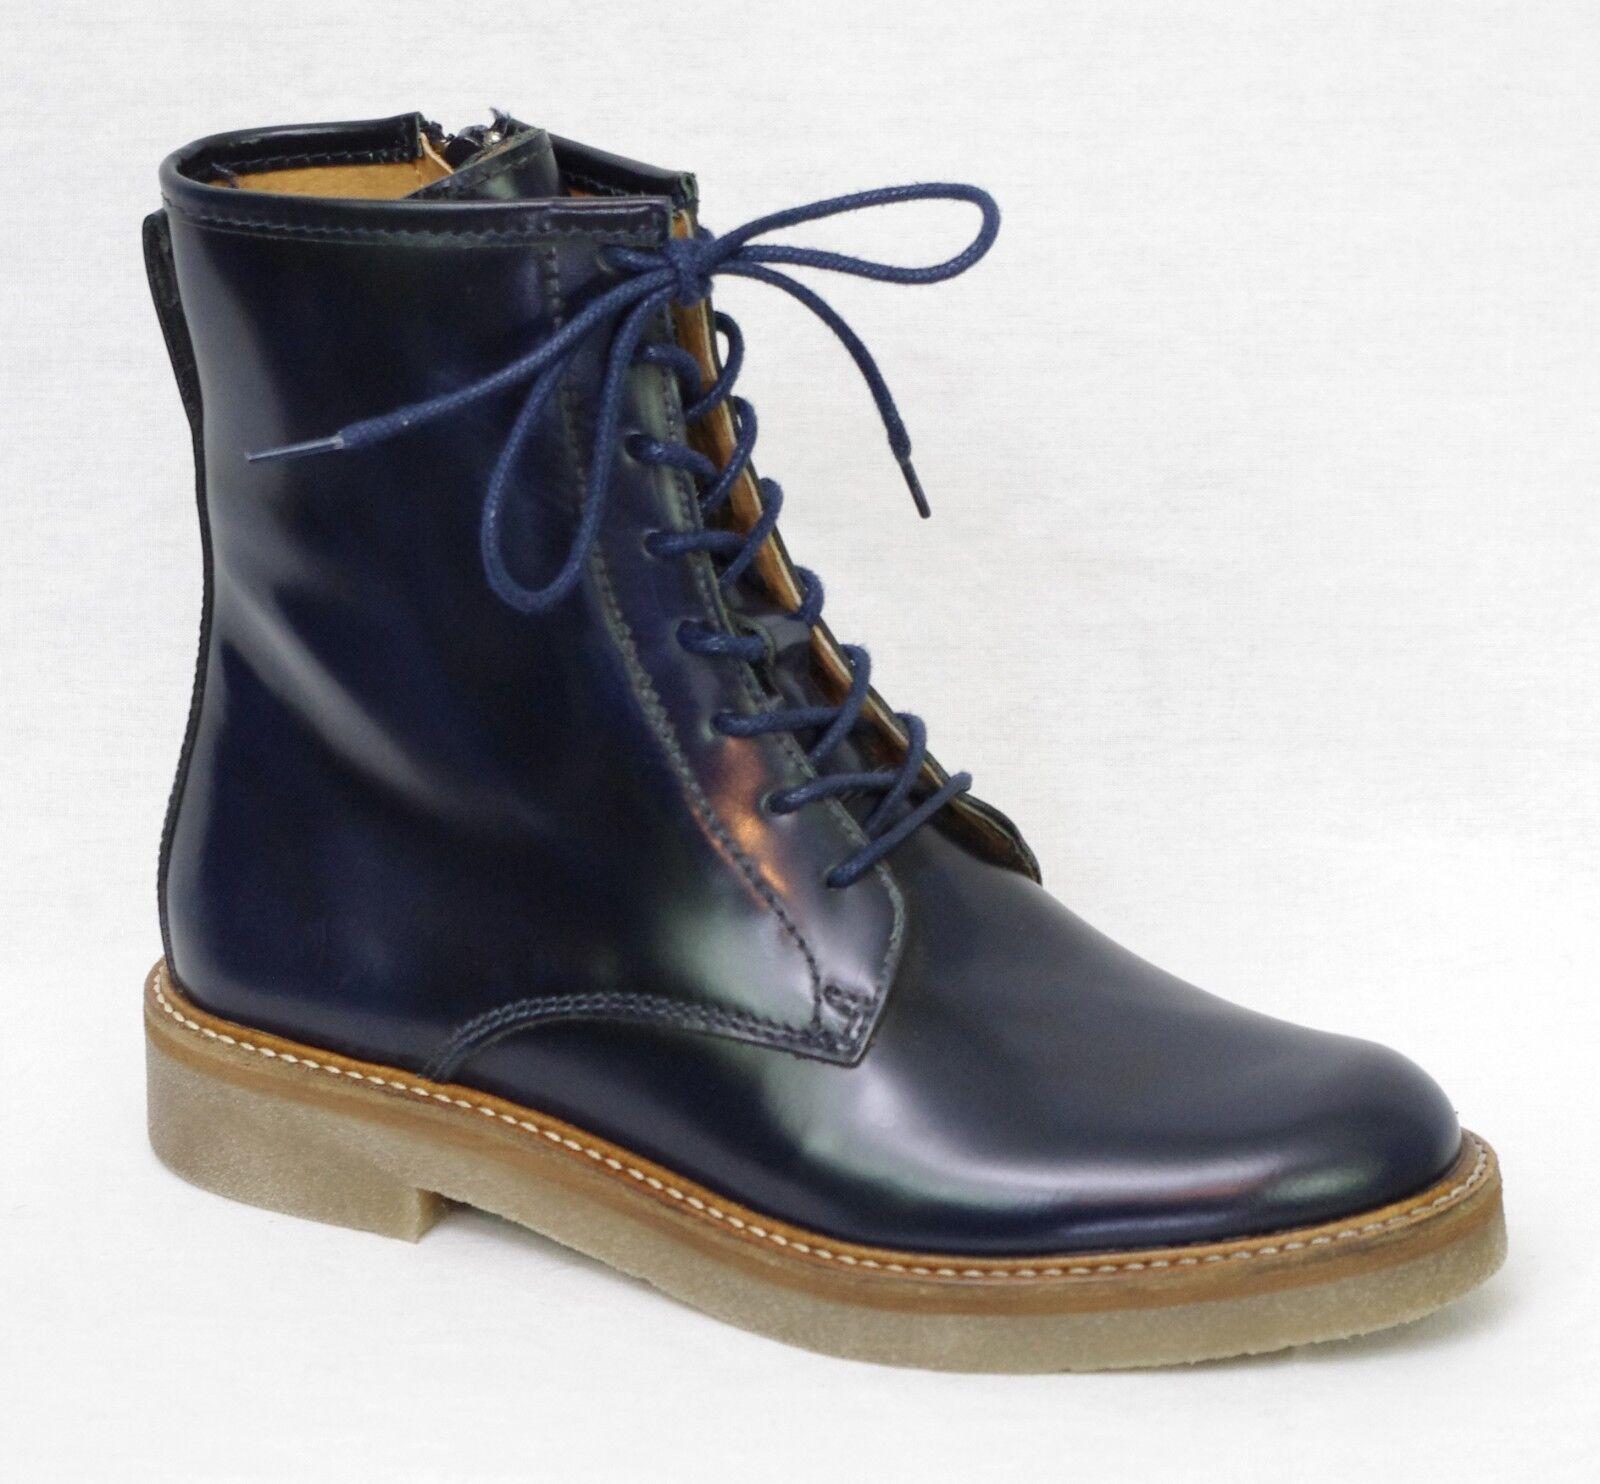 7a34051ae0dc46 KICKERS OXFORDO Bottines Boots cuir bleu marine femme 512110 5 | eBay